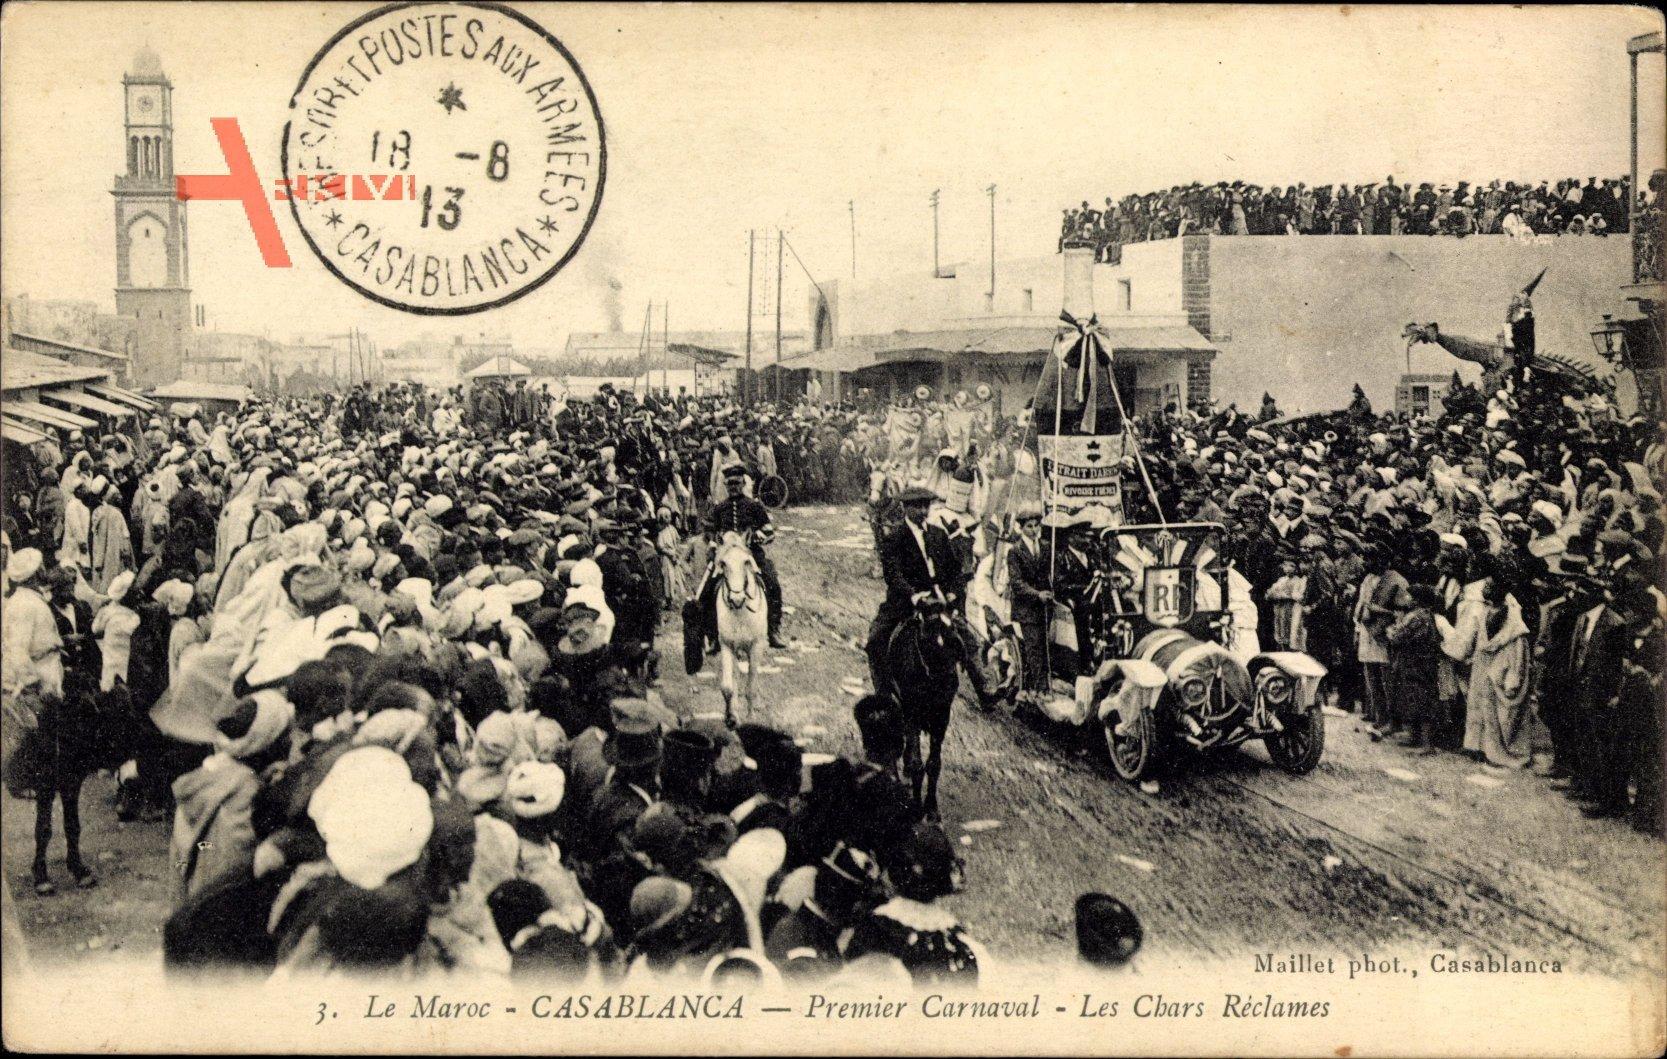 Casablanca Marokko, Premier Carnaval, les Chars Reclames